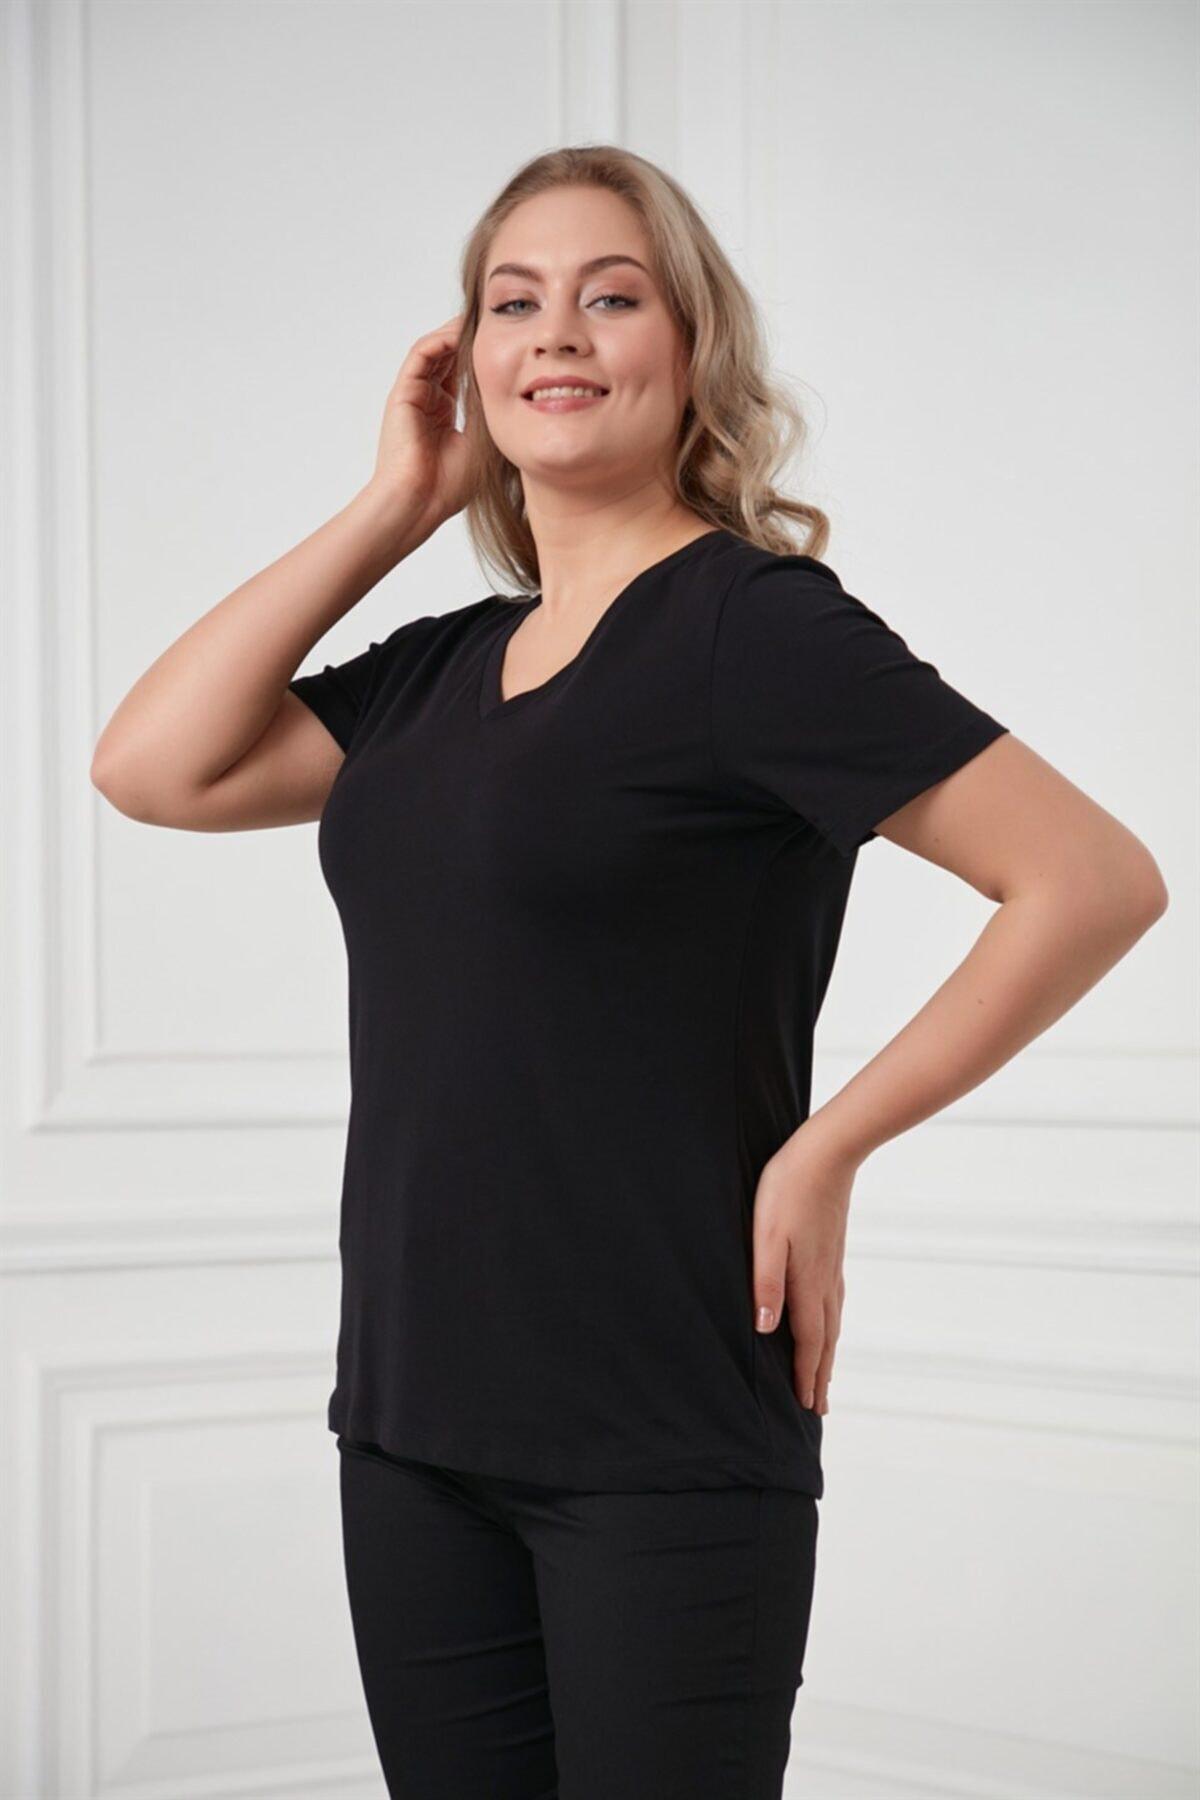 RMG V Yaka Büyük Beden Siyah Tişört 2